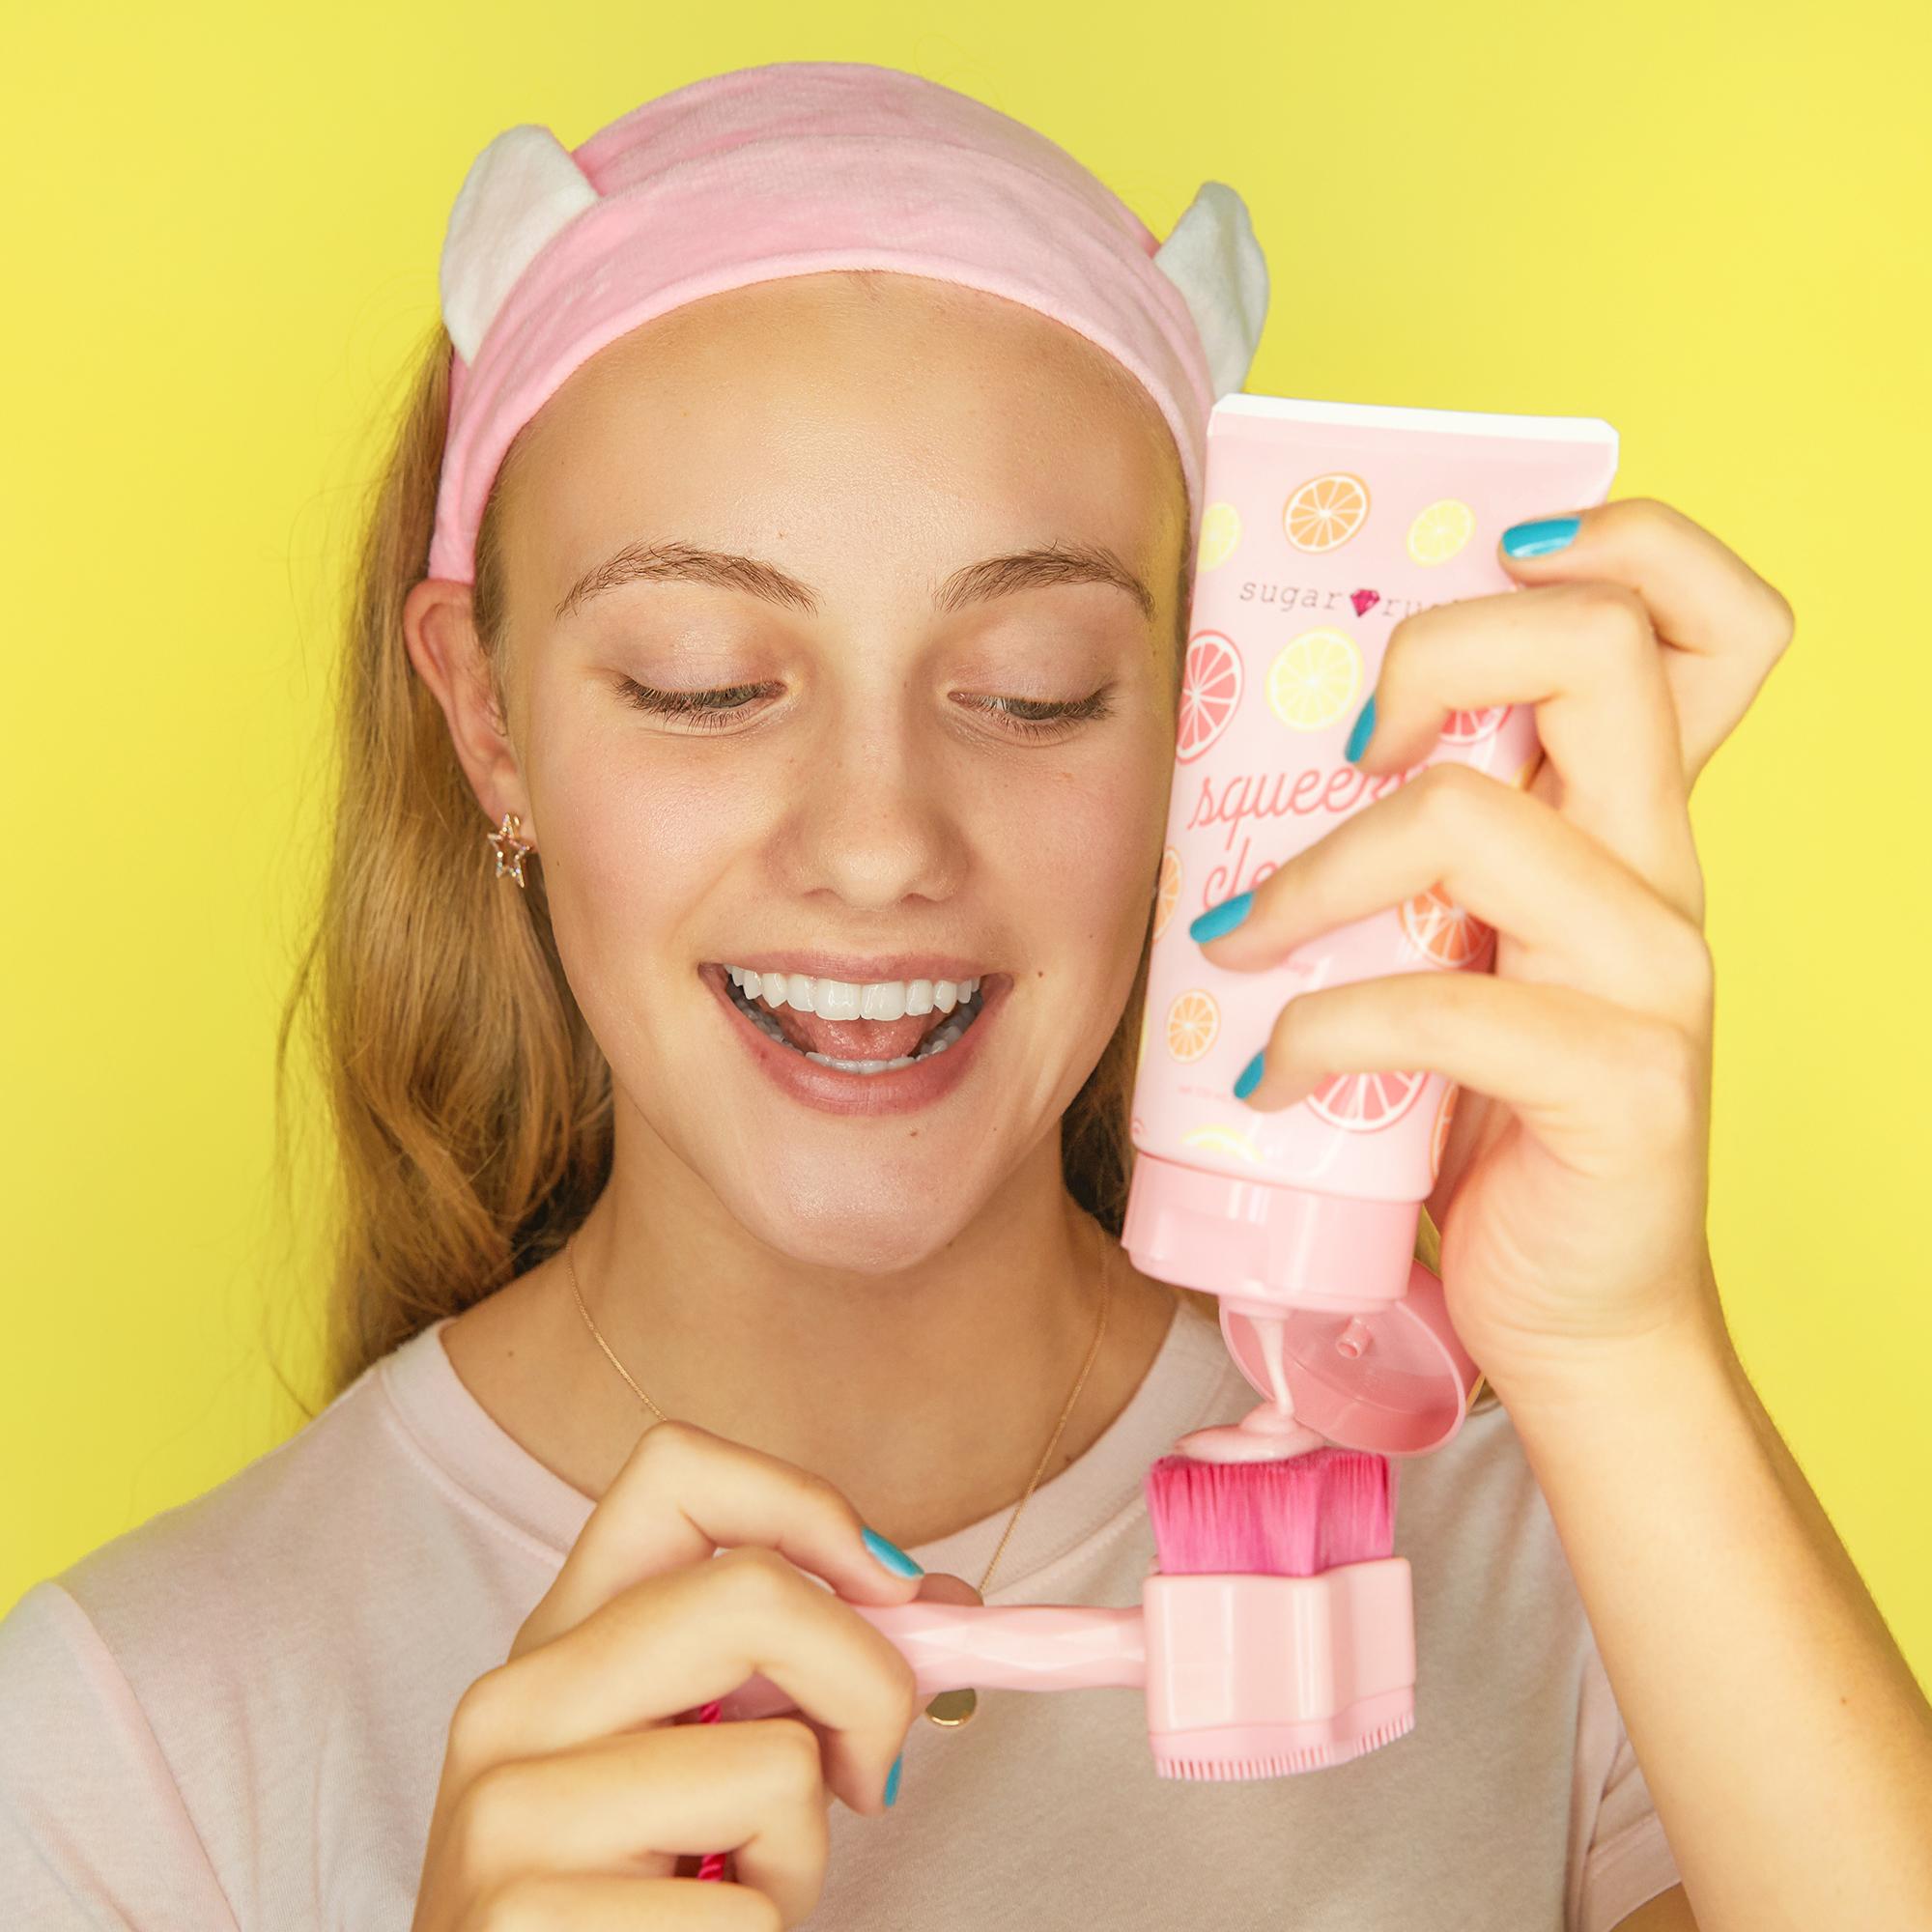 Sugar Rush Star Factor Cleansing Face Brush